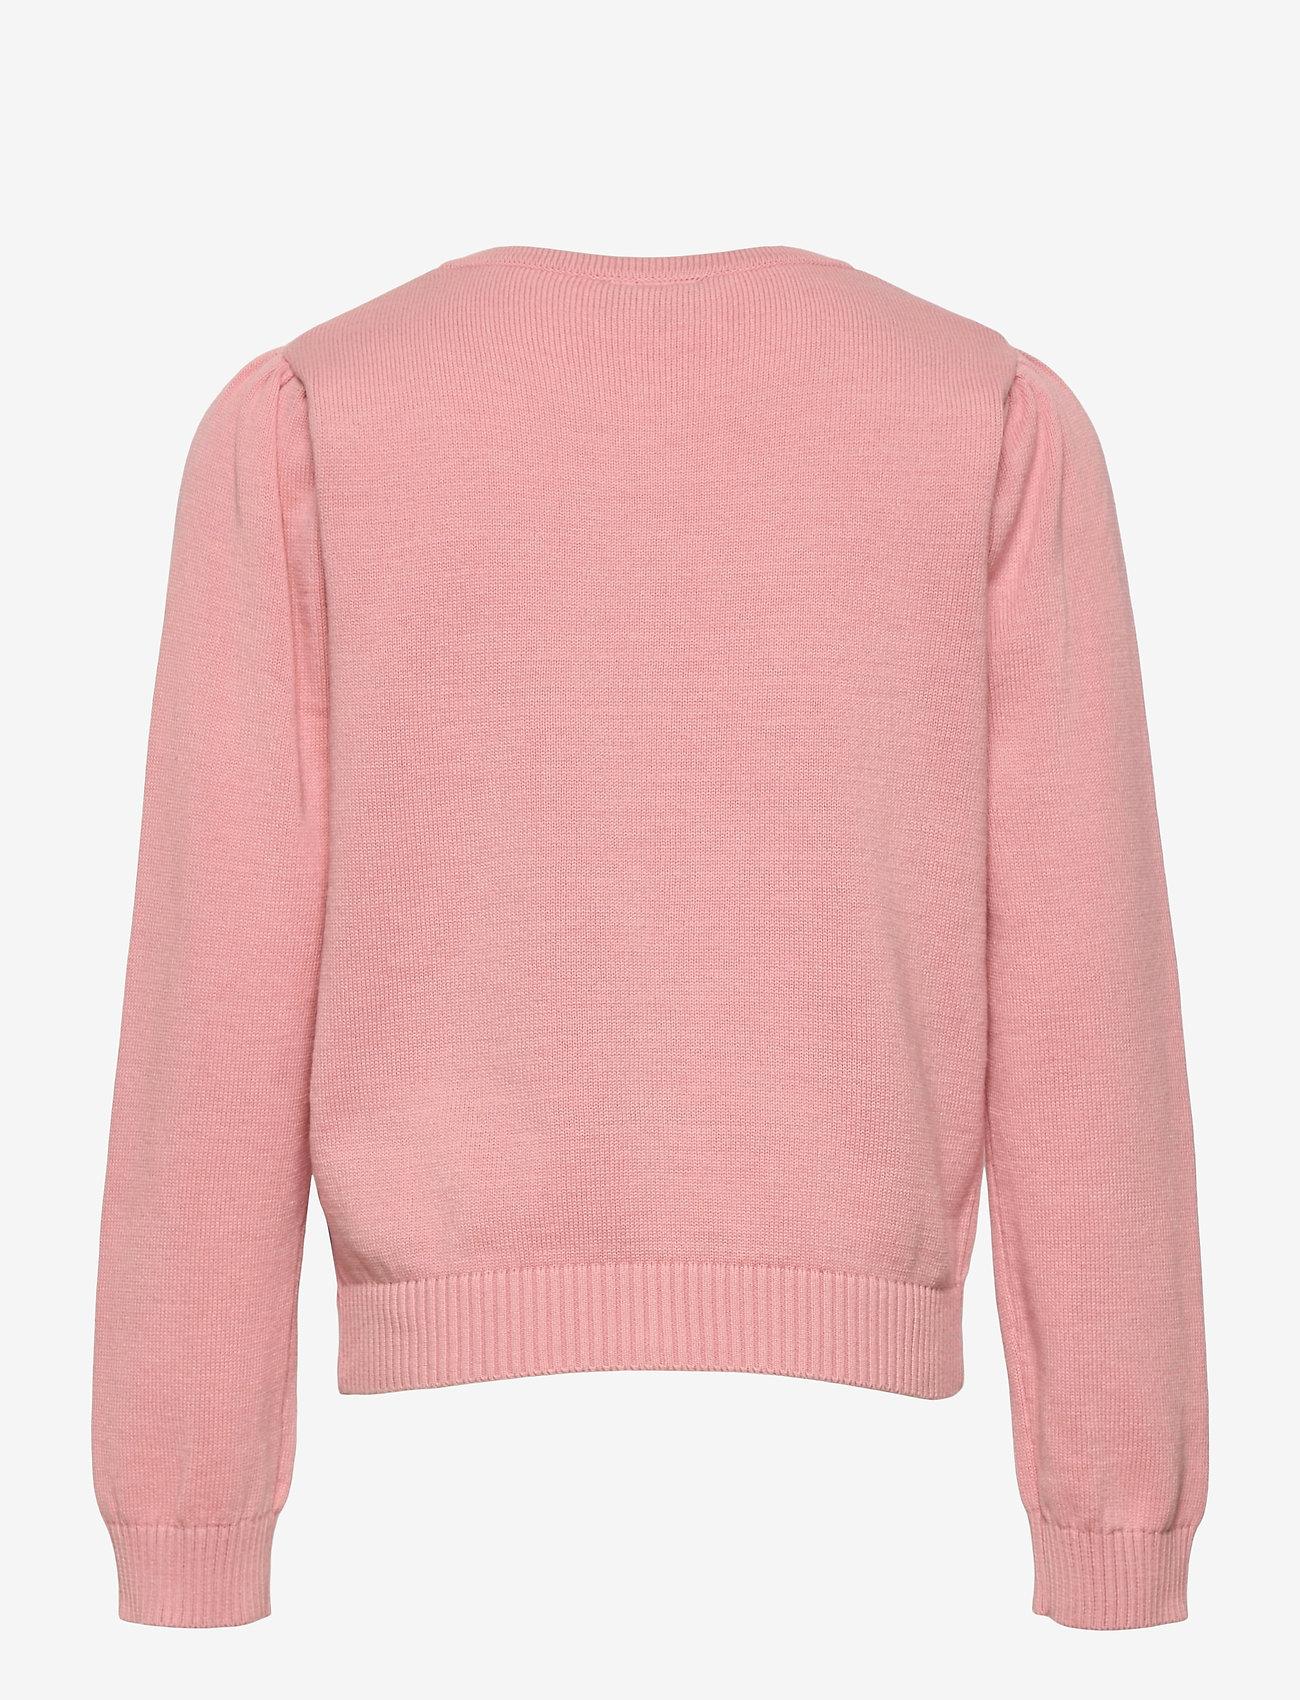 Polarn O. Pyret - Cardigan Knitted Solid School - bridal rose - 1